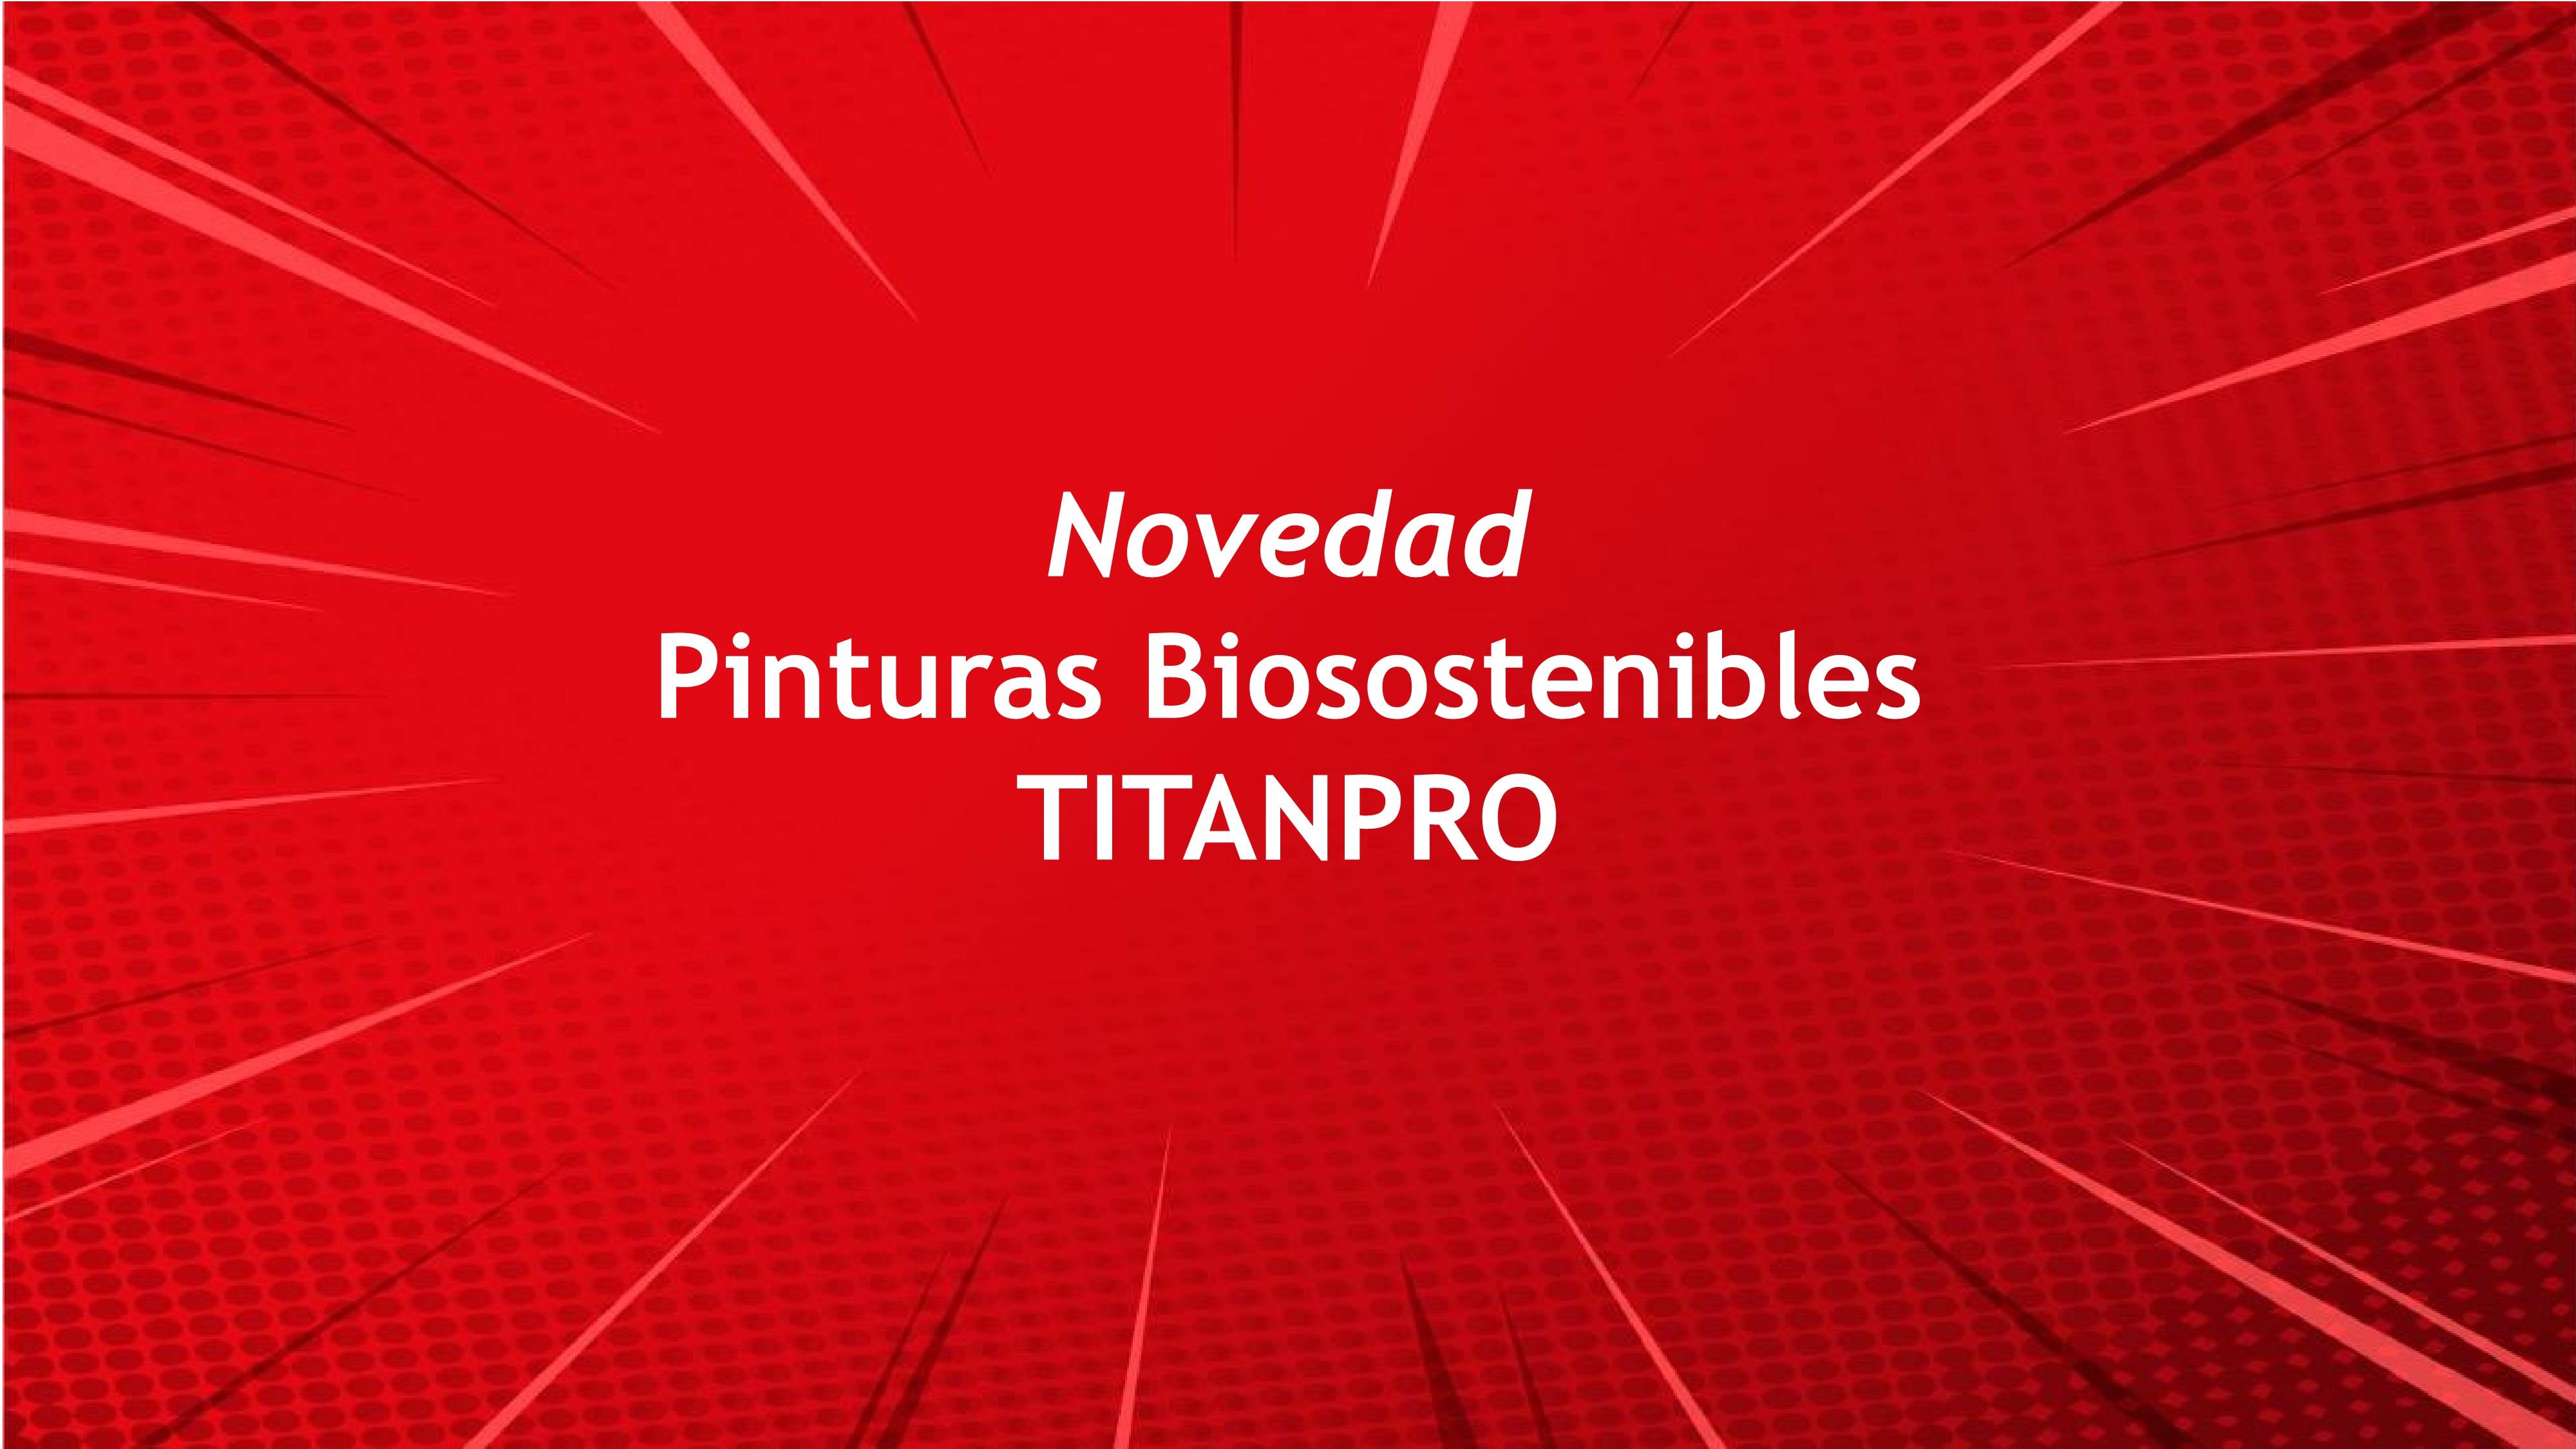 Informacion pintura biosostenible Titanpro